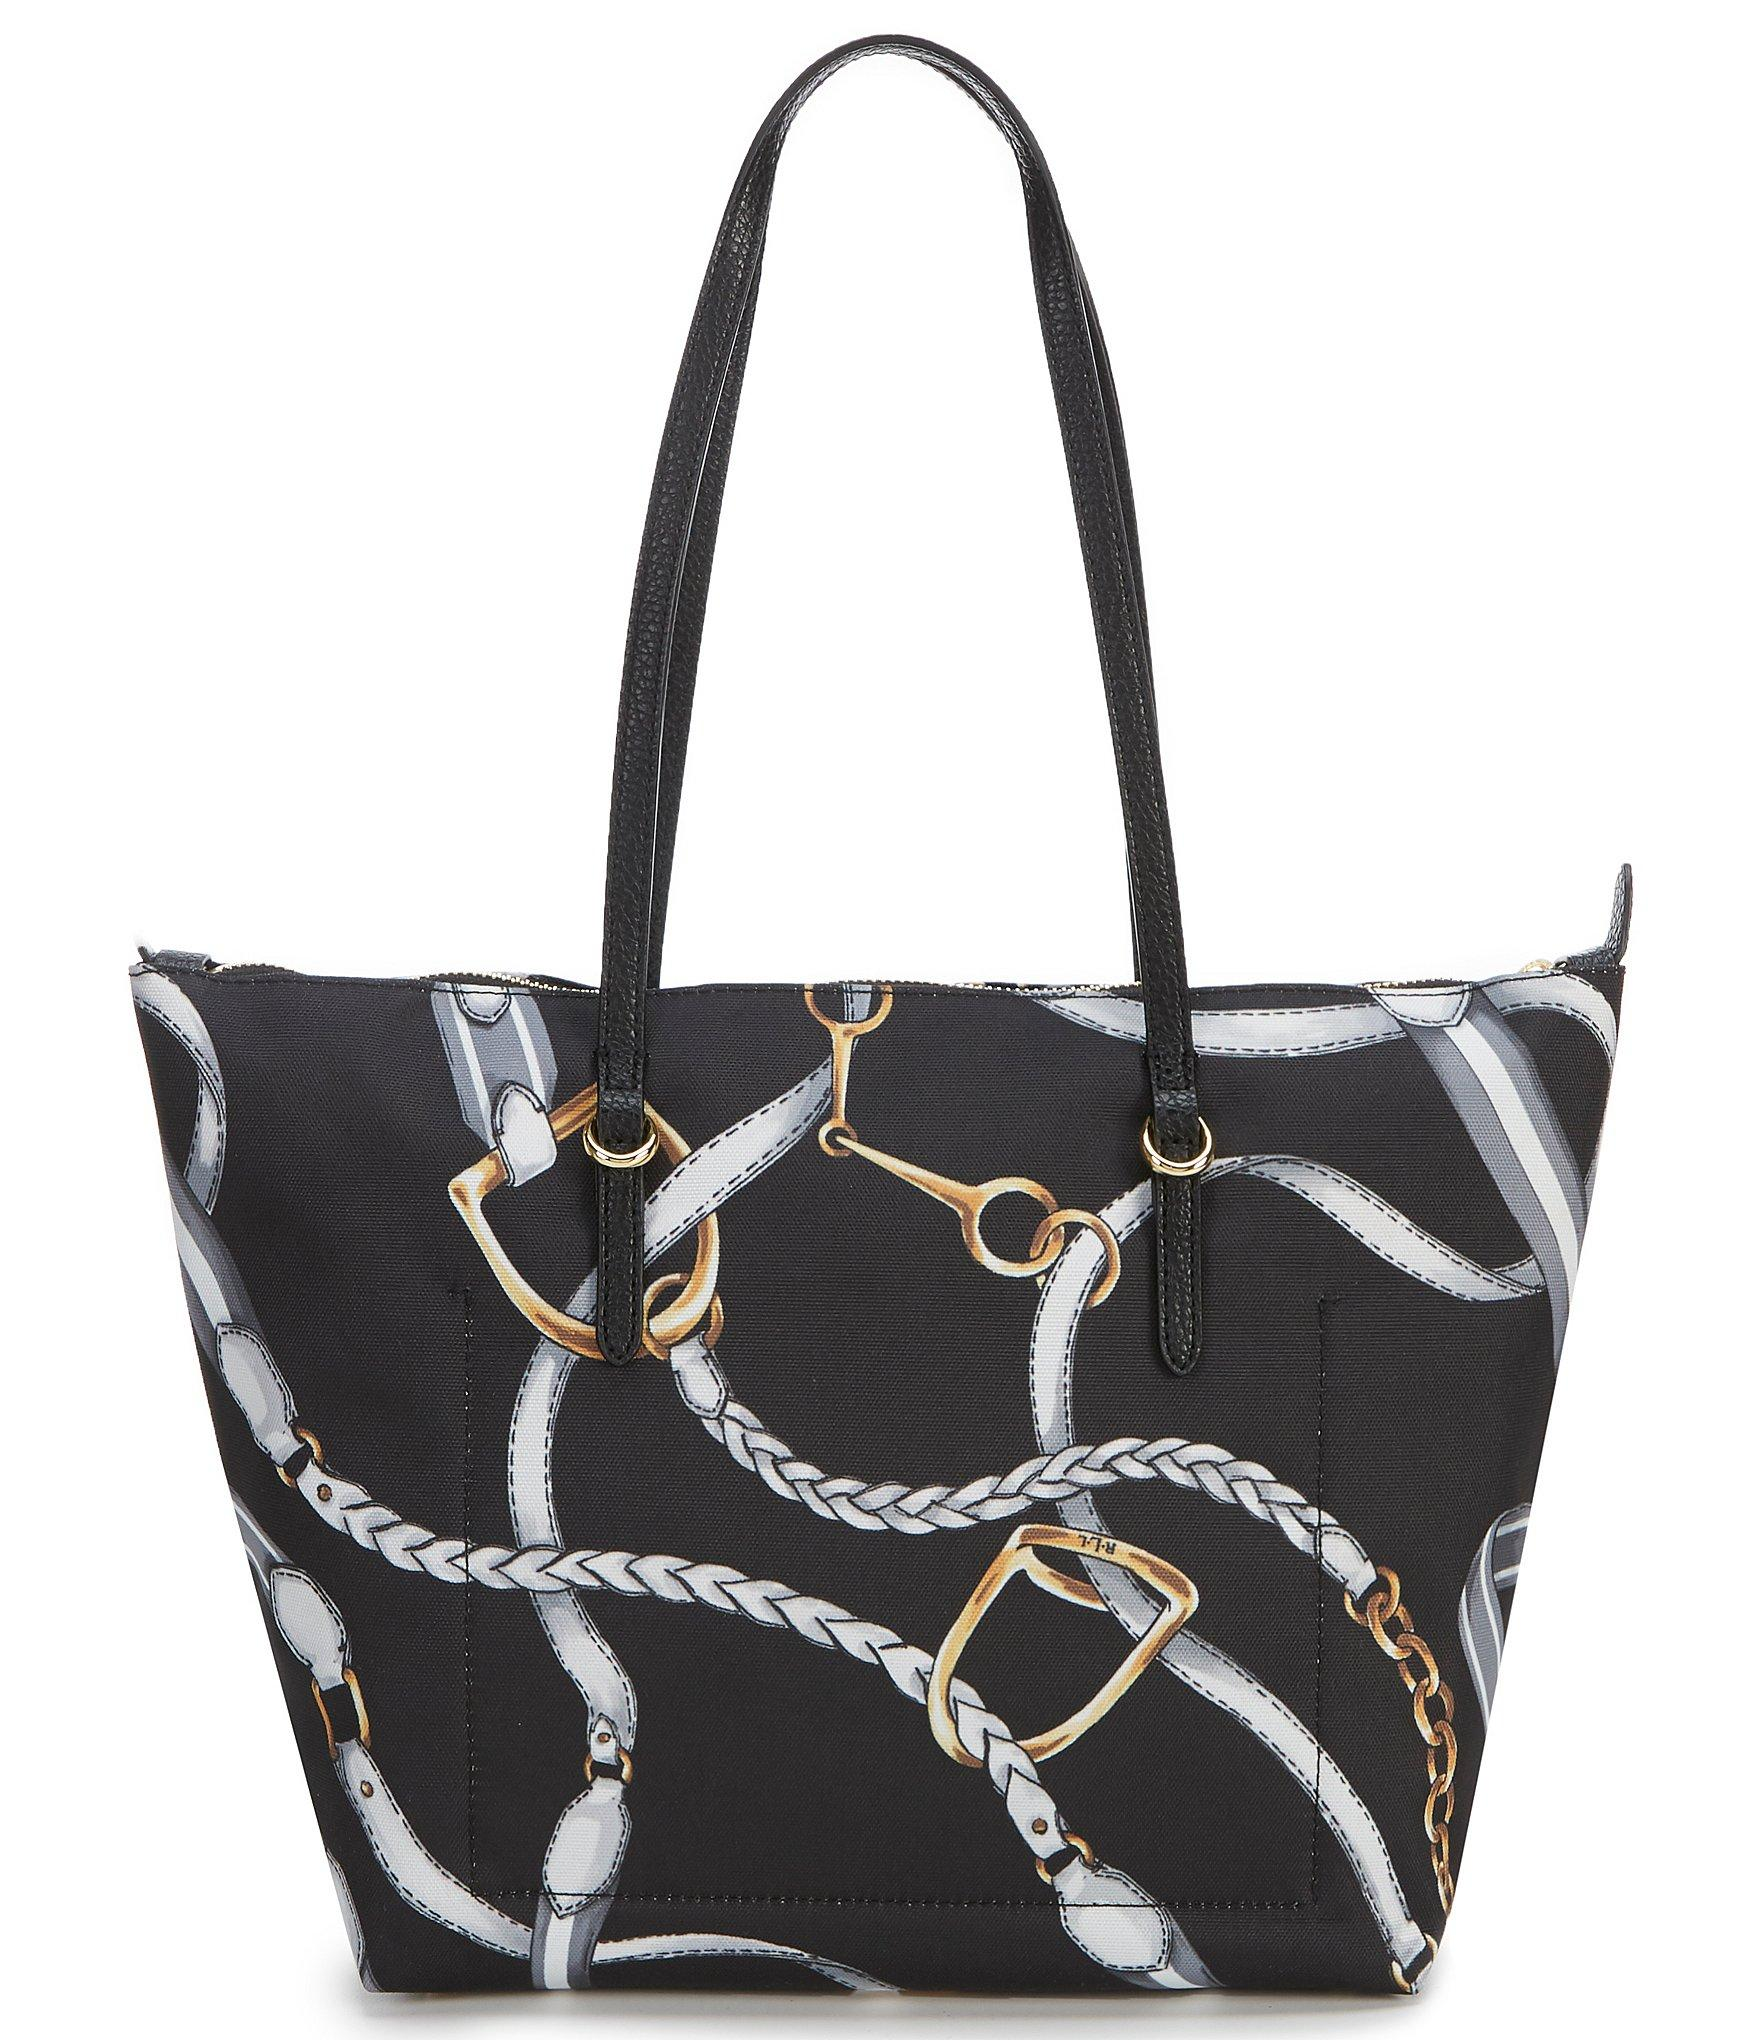 Lauren by Ralph Lauren - Black Chadwick Medium Tote Bag - Lyst. View  fullscreen 58a07b76a9947